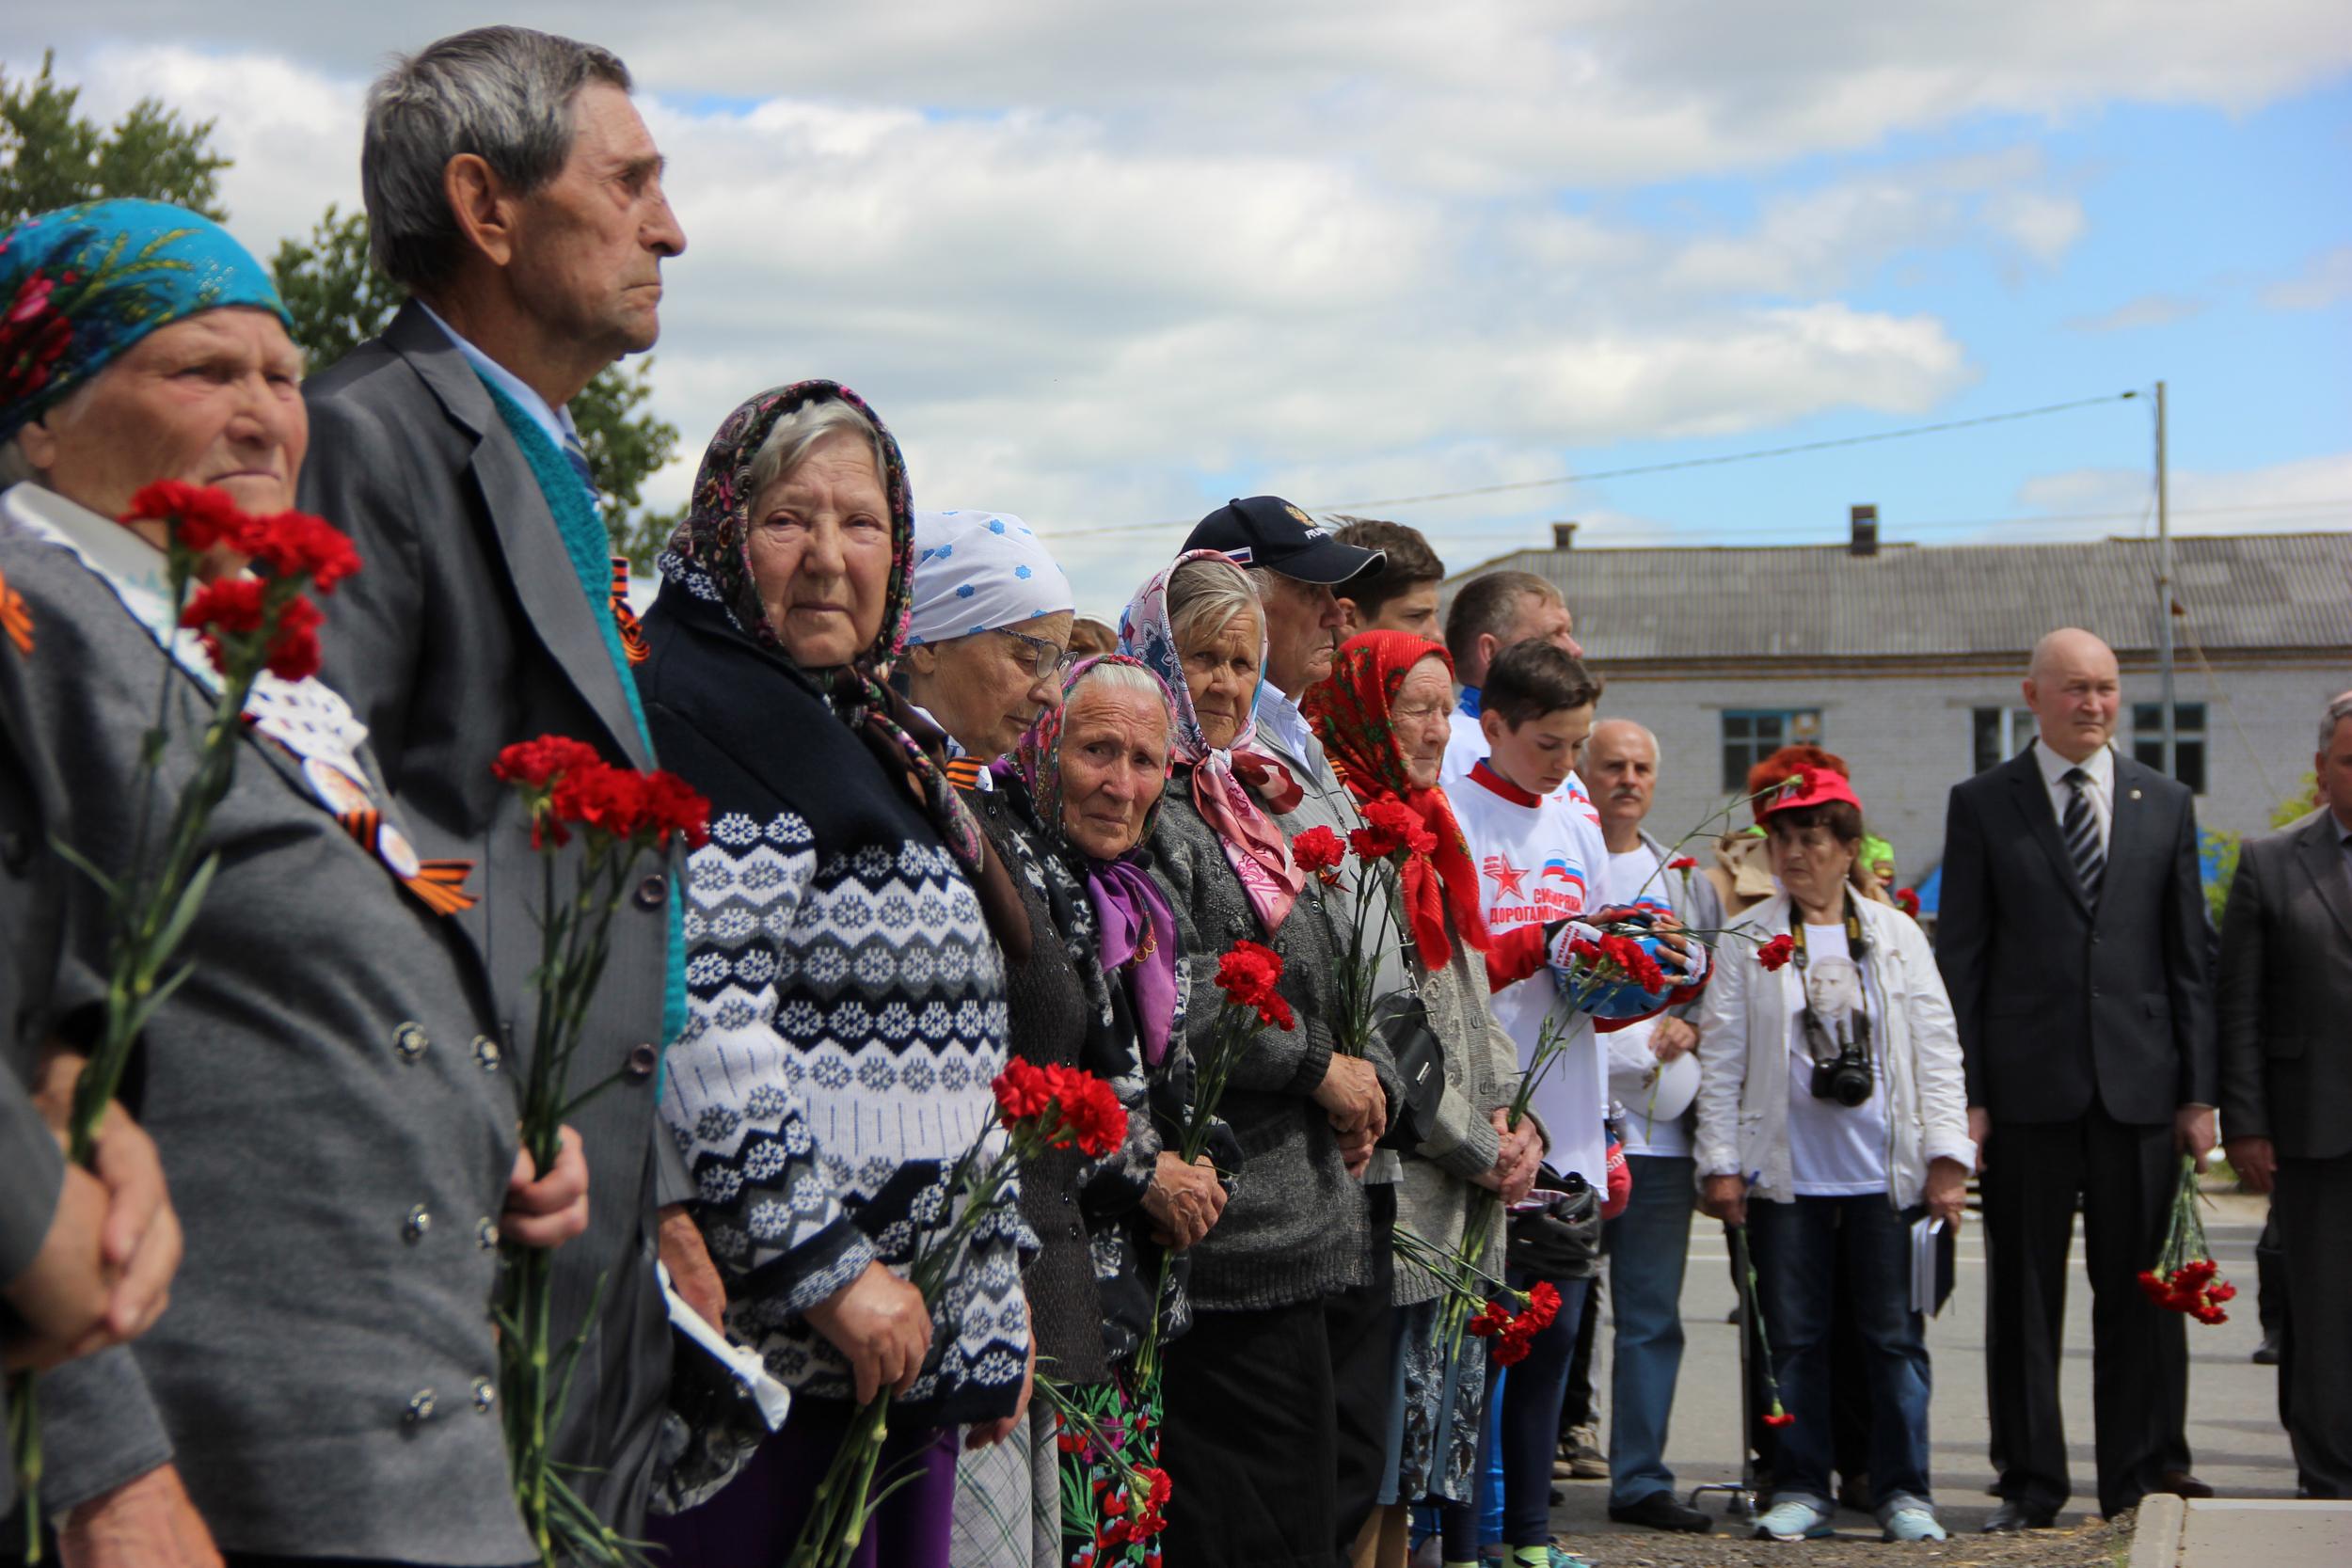 На митинге в Богандинском. Фото Павла Моргуна.